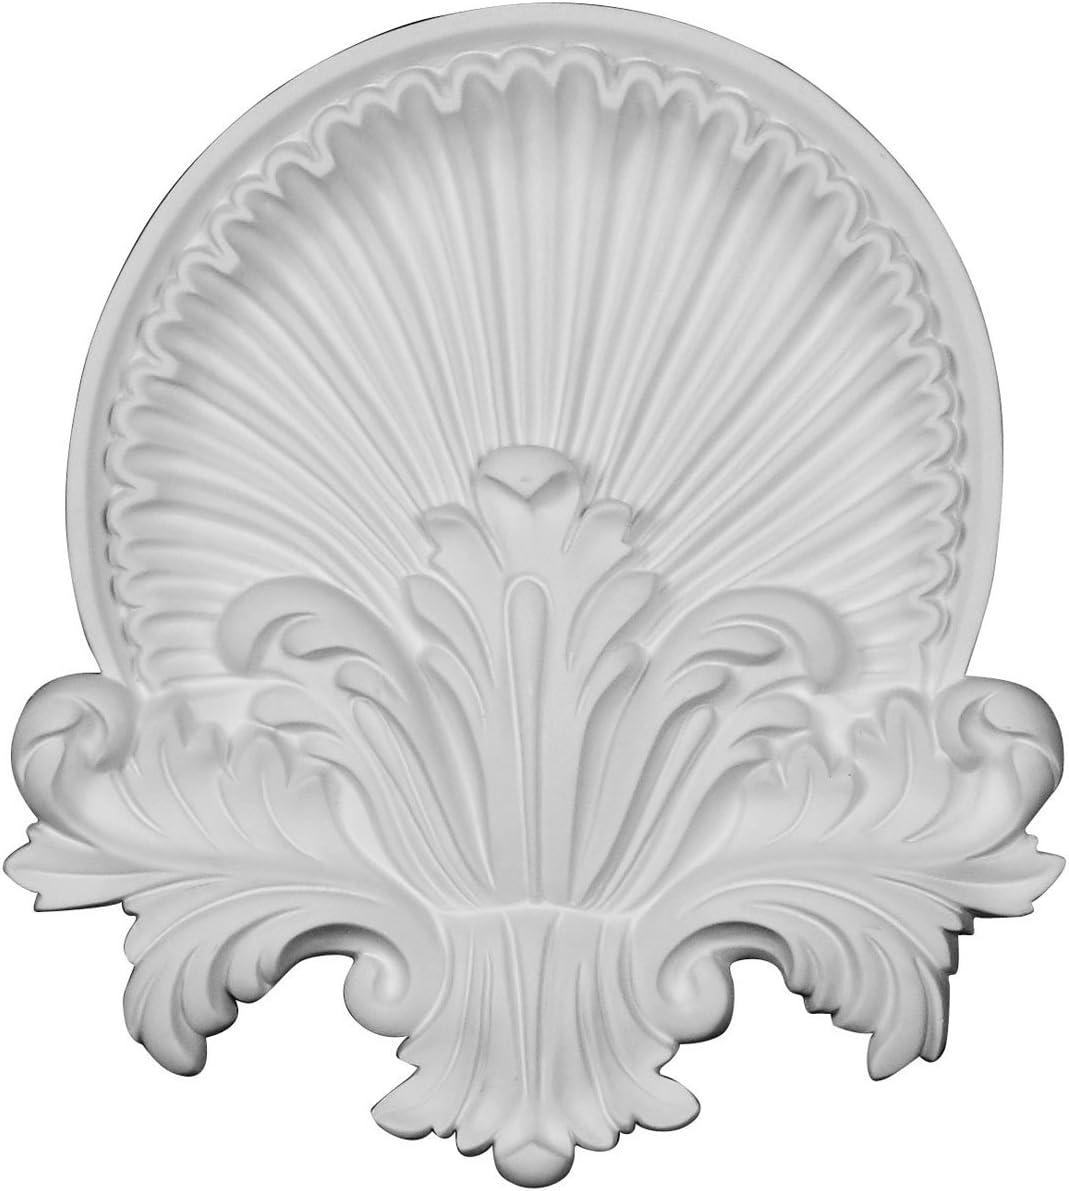 Ekena Millwork ONL10X11X01SH 10 5//8W x 11 3//4H x 1 1//8P Shell Center Onlay Factory Primed White